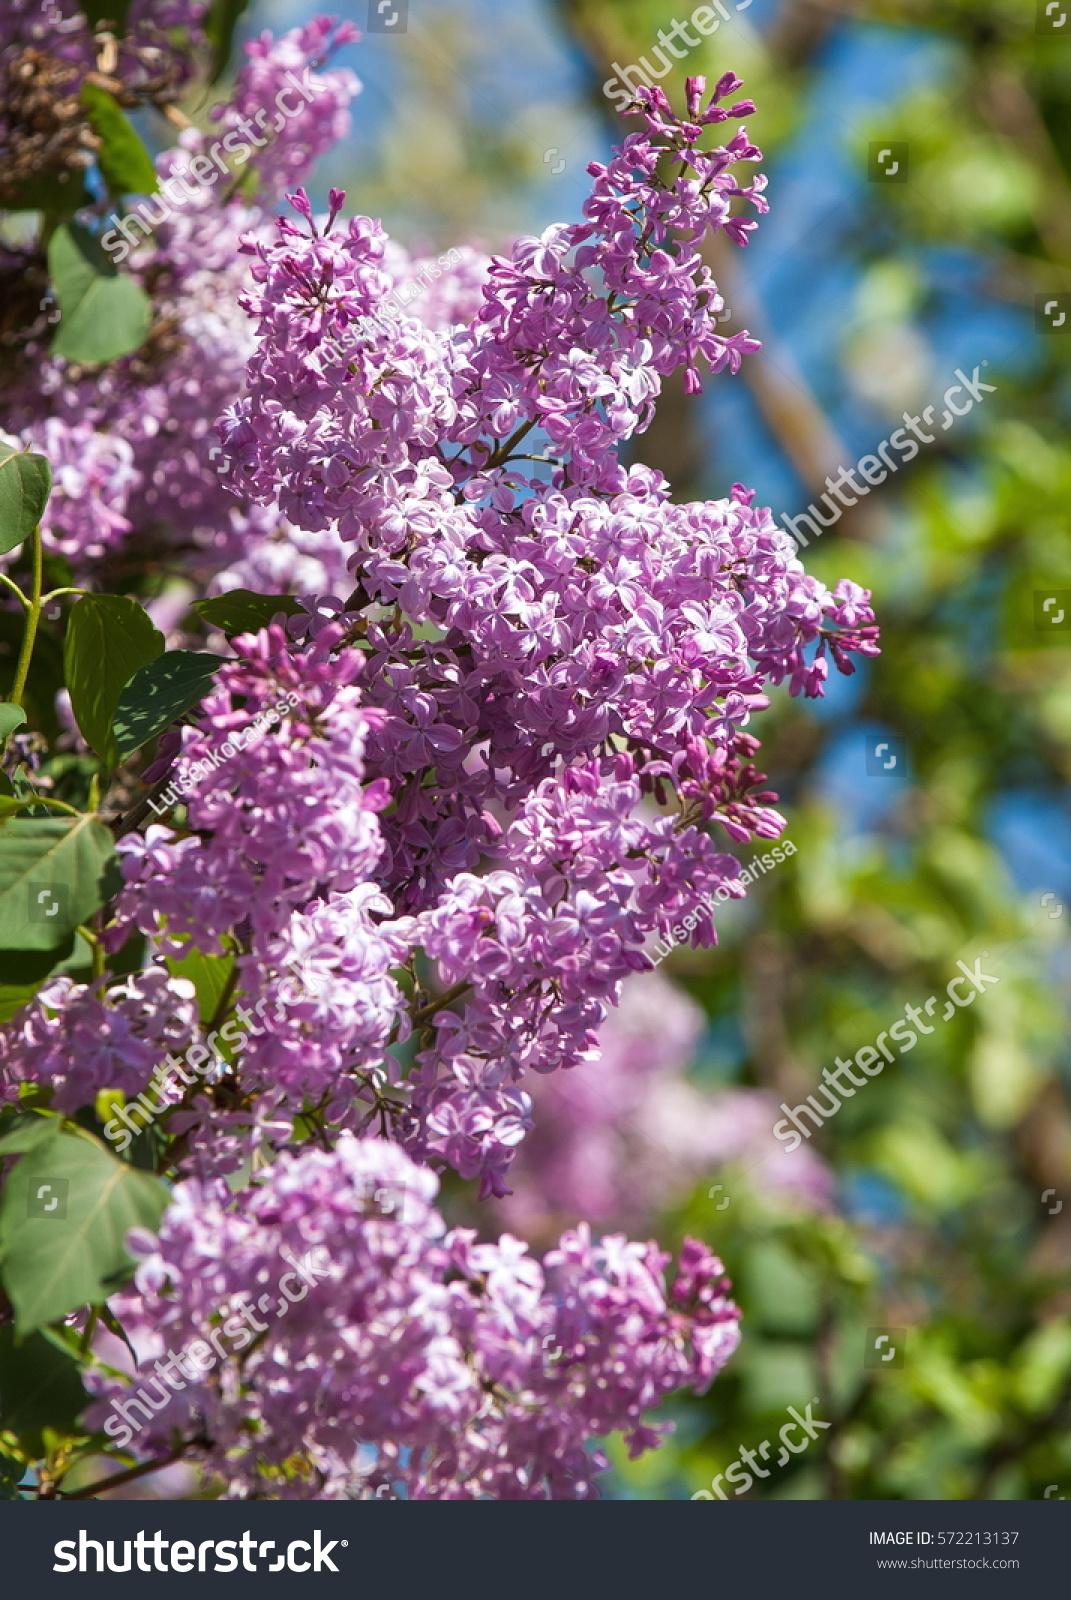 Lilac Flowers Large Garden Shrub Purple Stock Photo 572213137